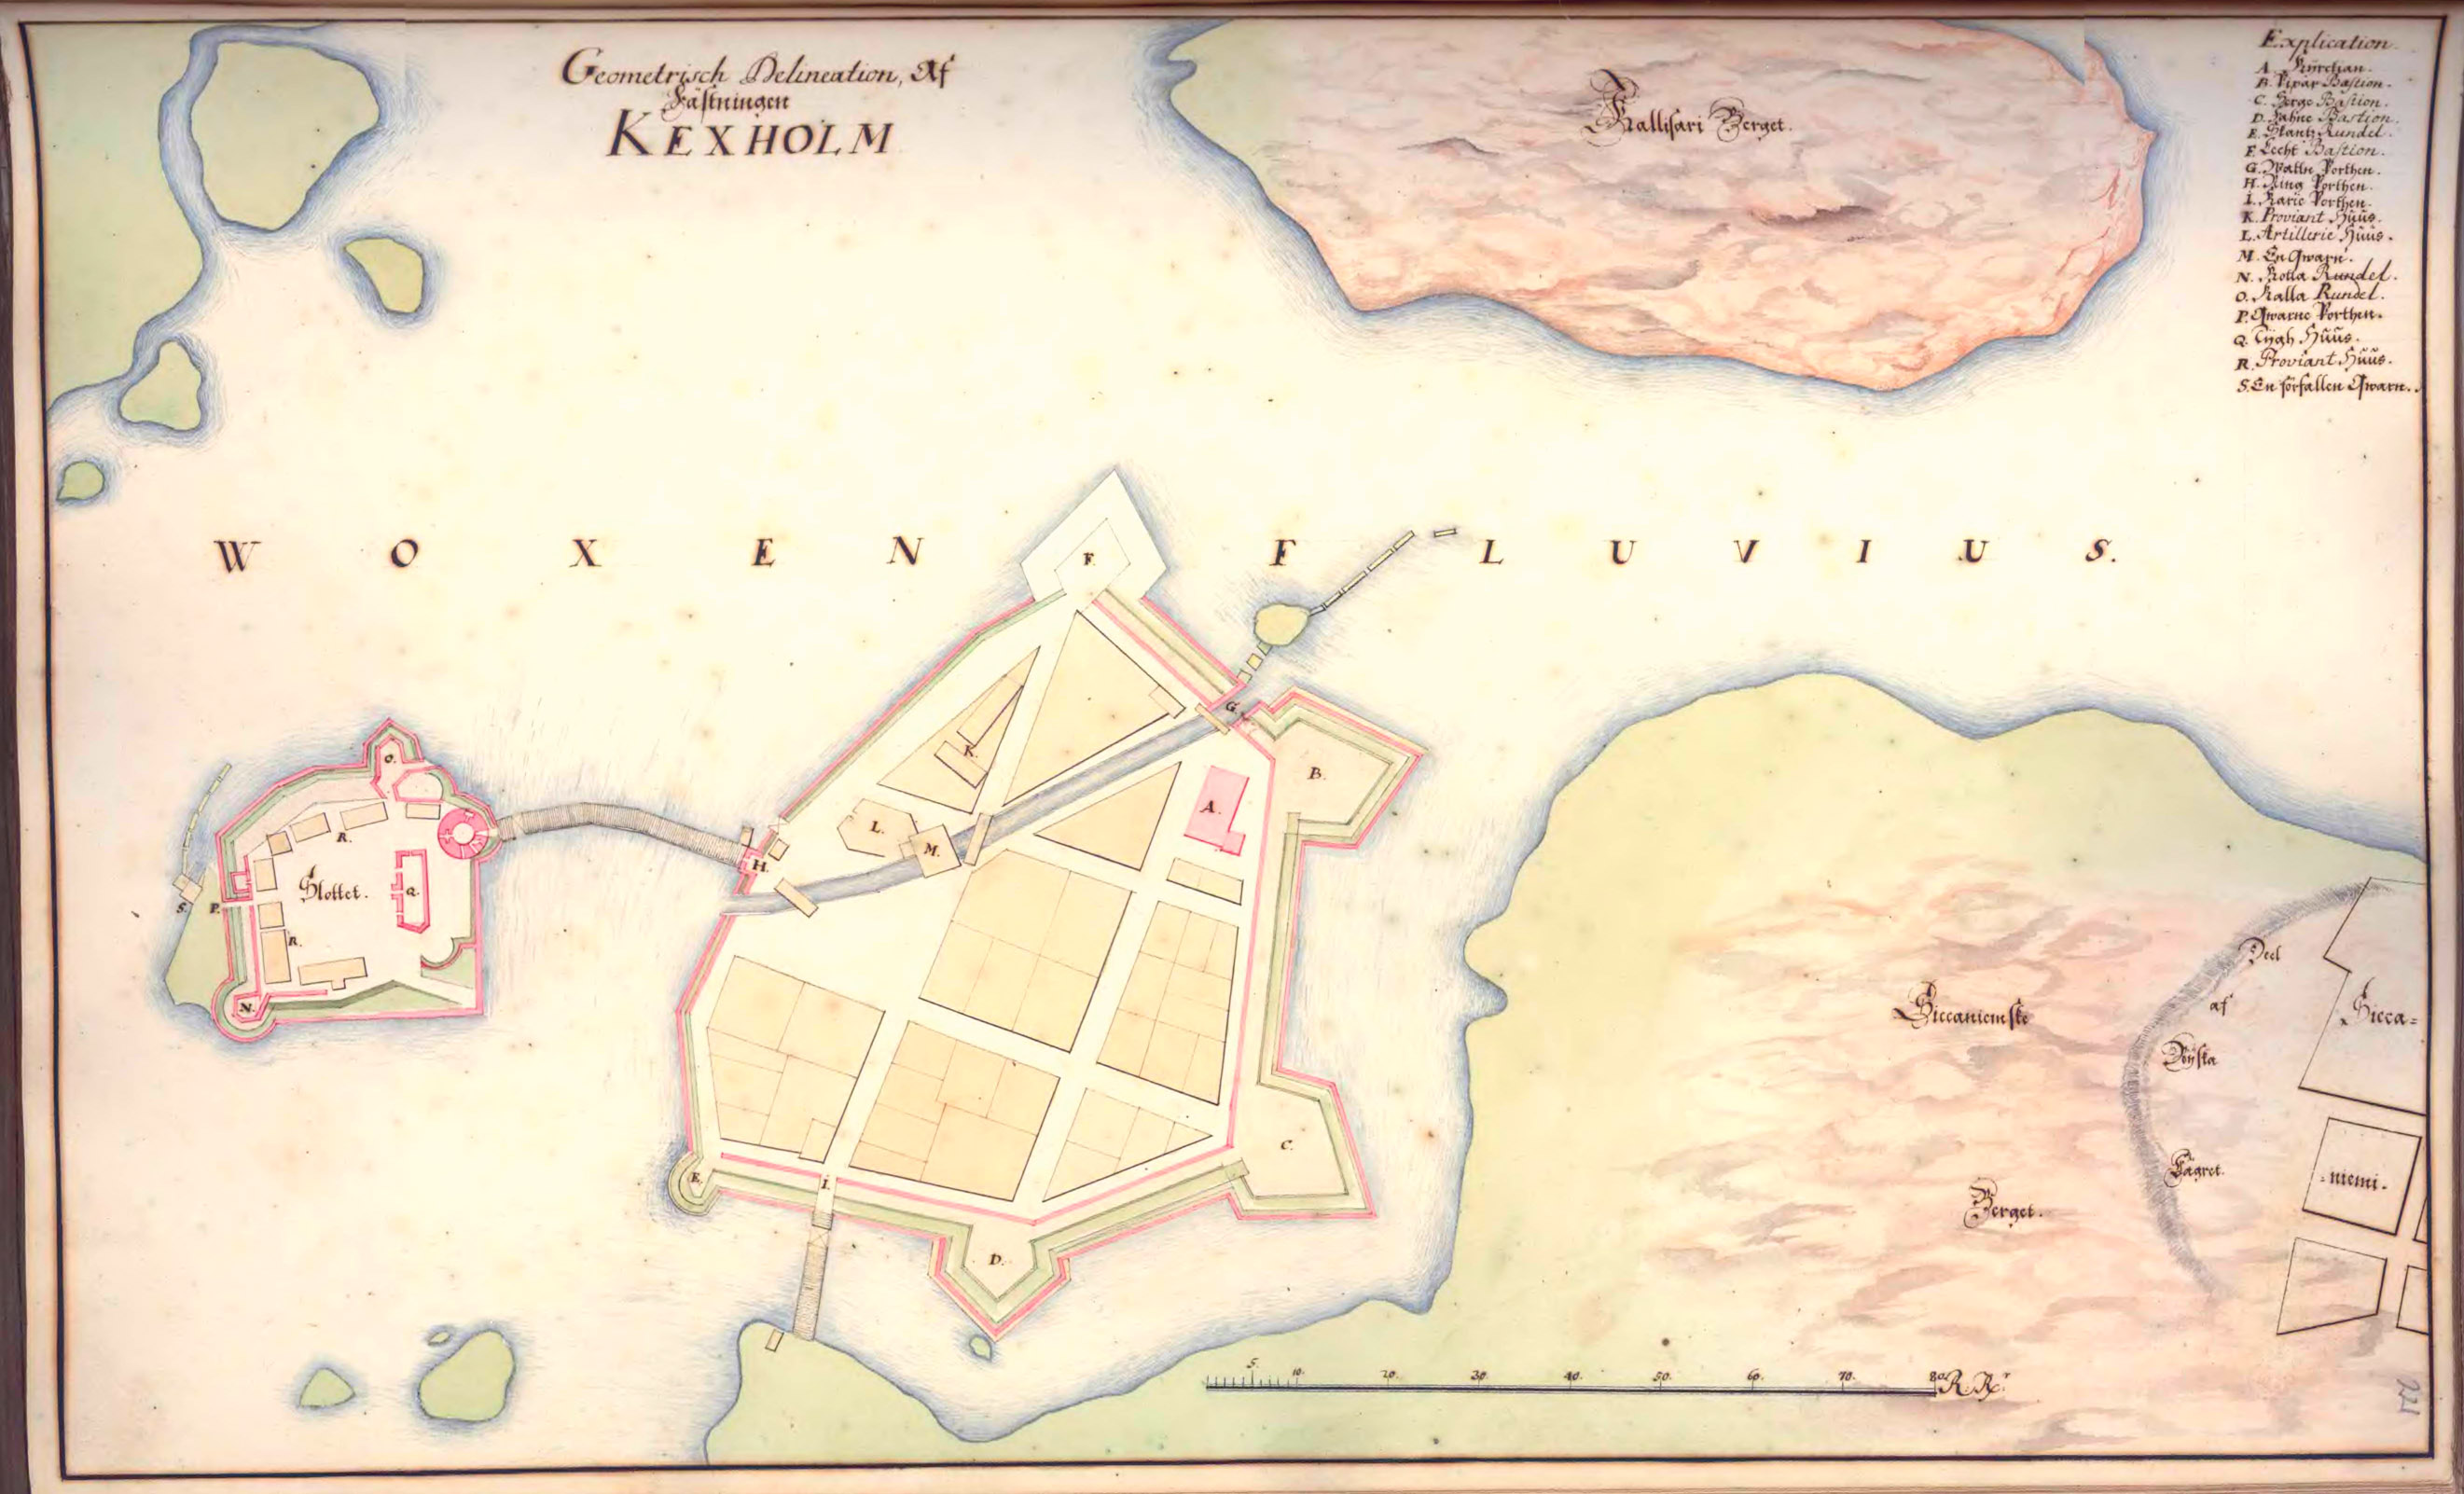 План Кексгольма 1670-1690 года.